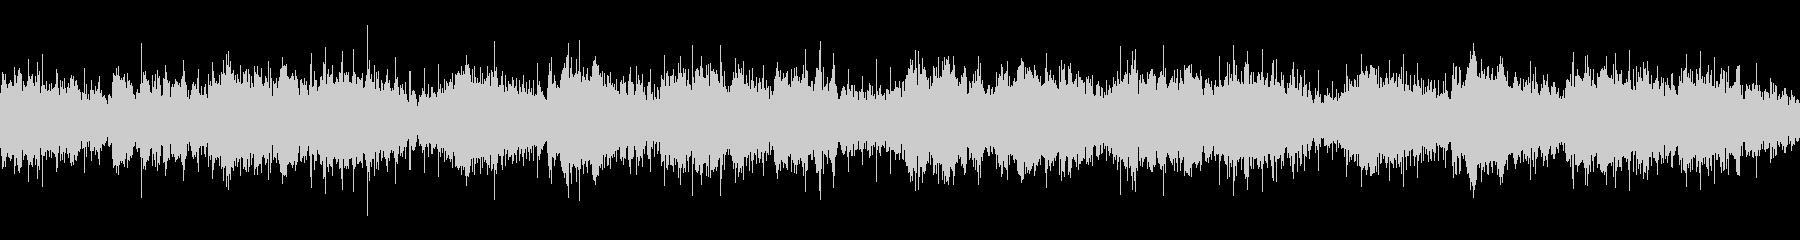 Piano lounge music loop's unreproduced waveform